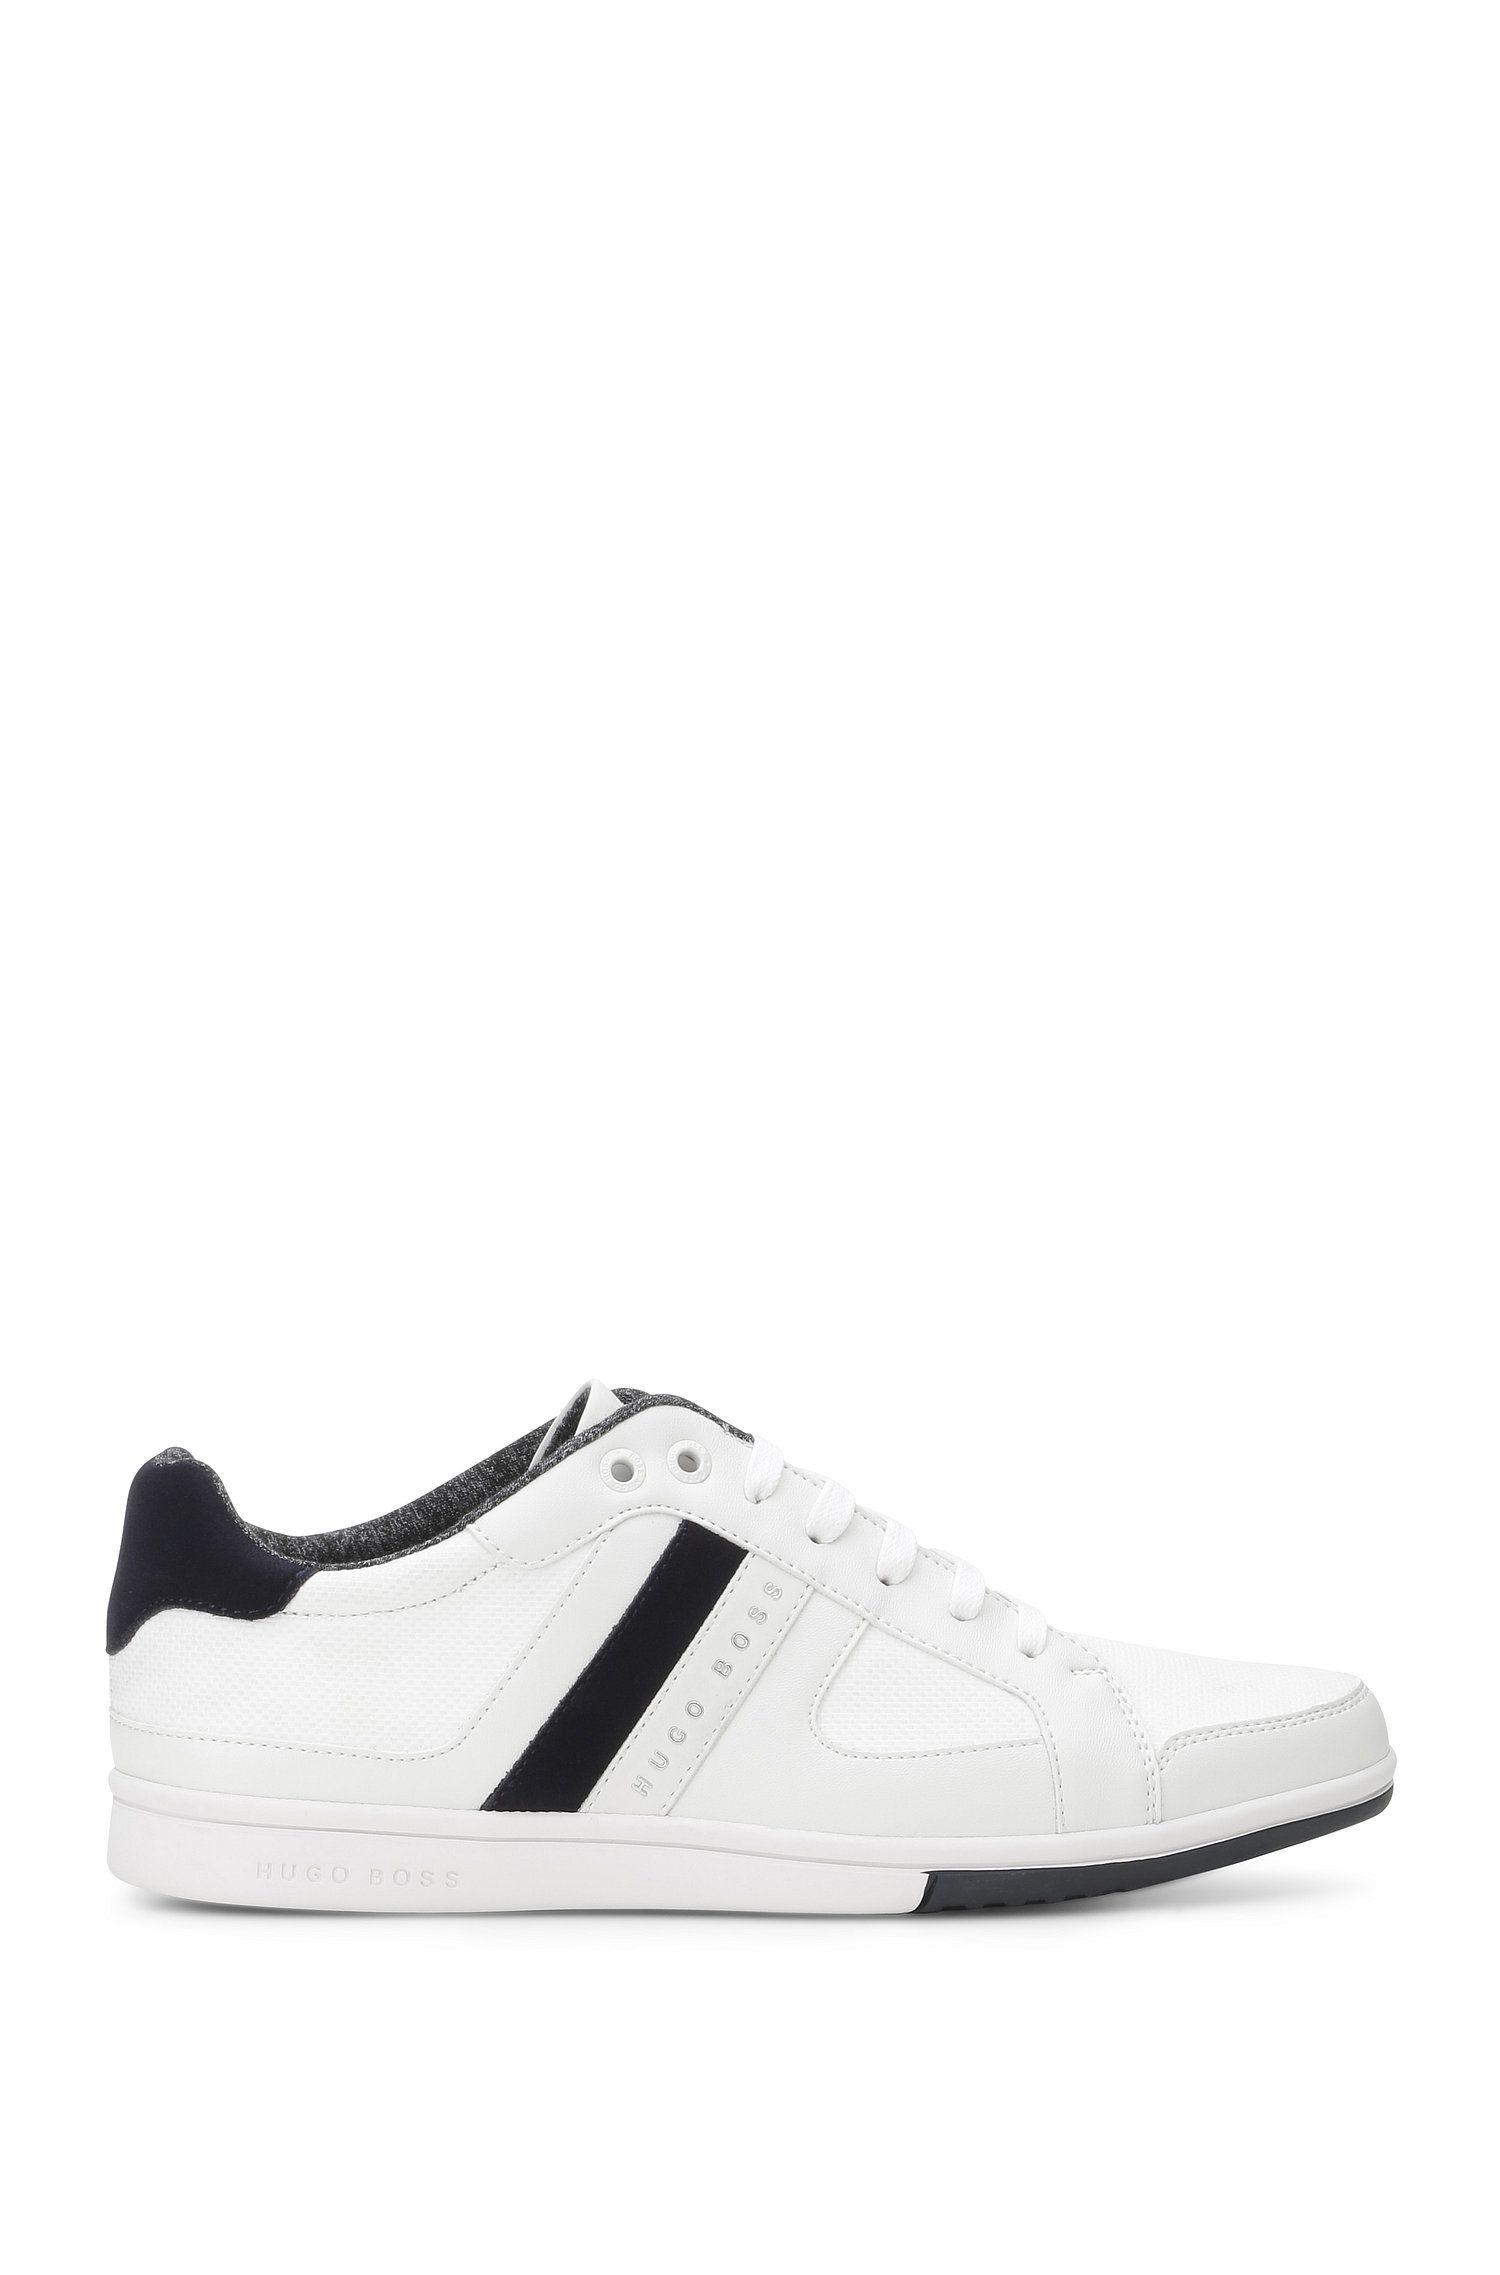 Low Top Sneakers aus Material-Mix: ´Metro_Tenn_cvc`